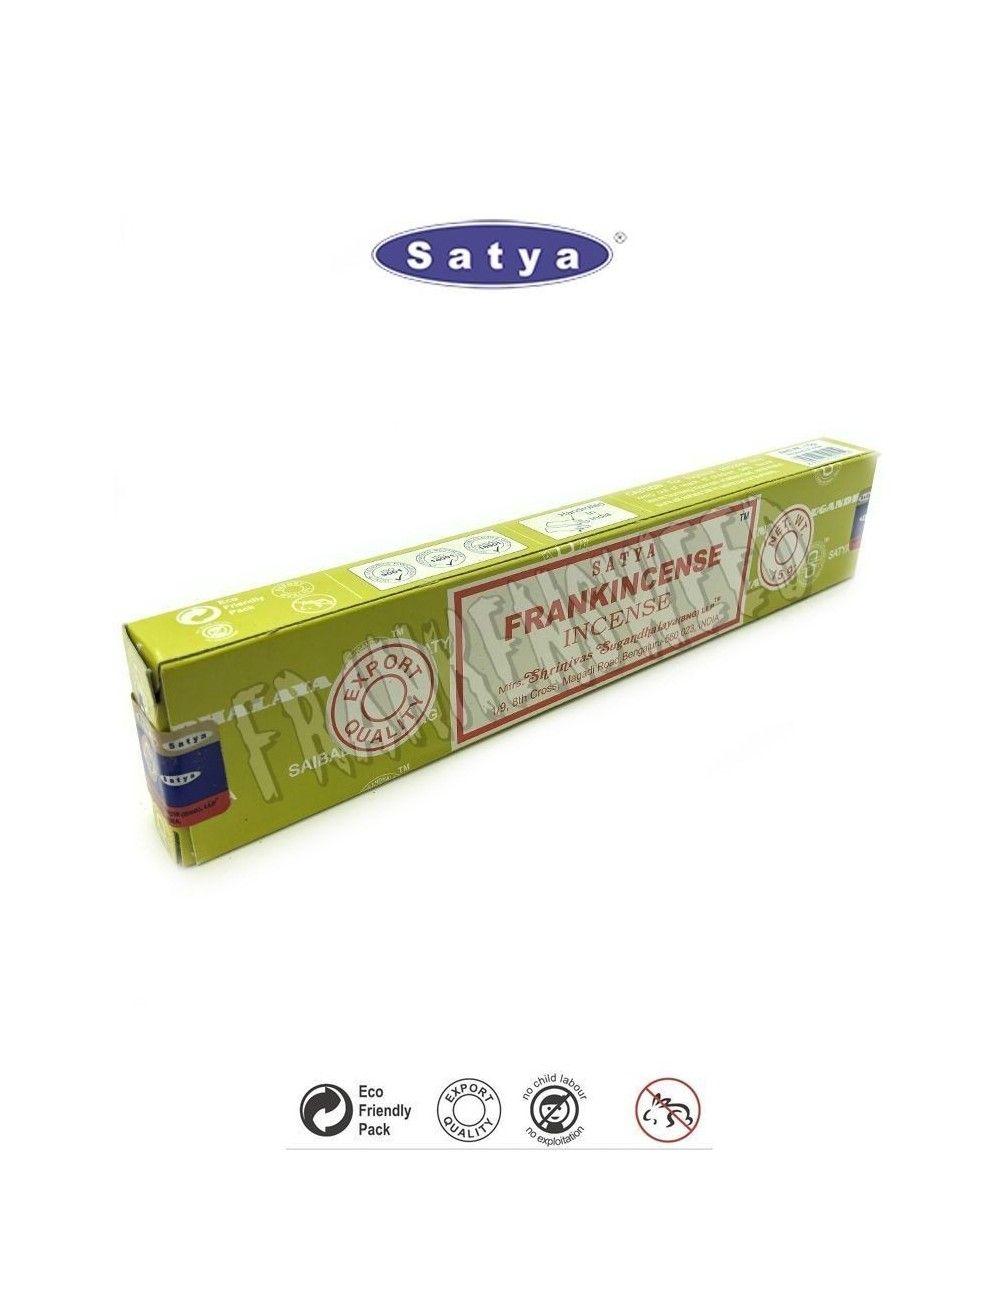 Frankinciense - Satya Sai Baba - Incense Sticks